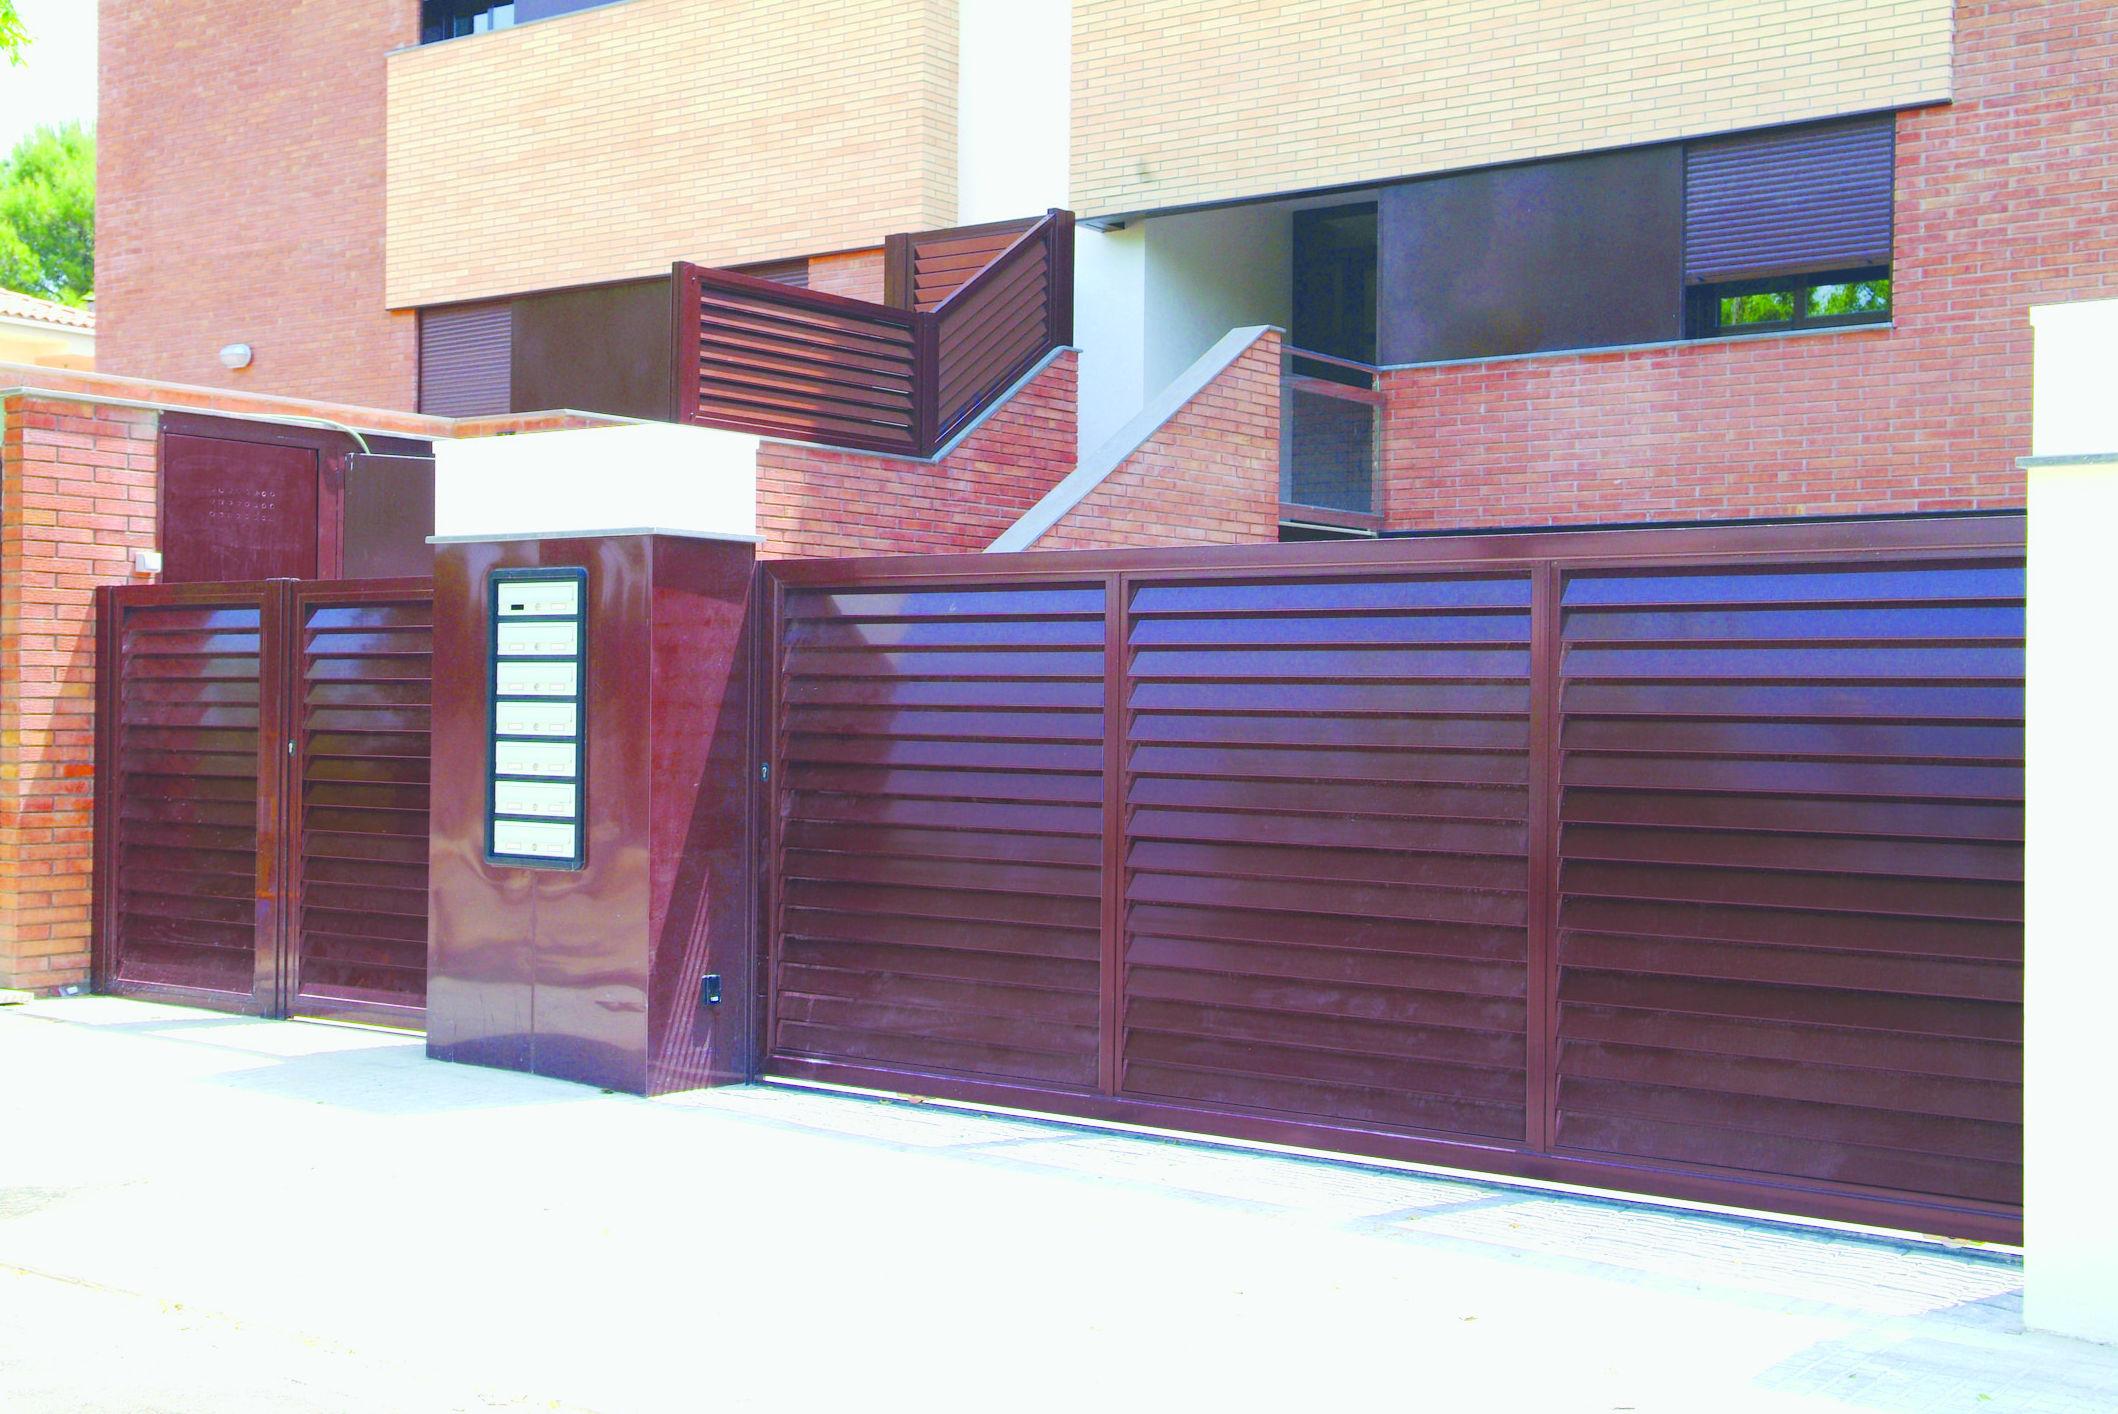 Puertas y valla de aluminio comunitaria tipo mallorquina vierte aguas